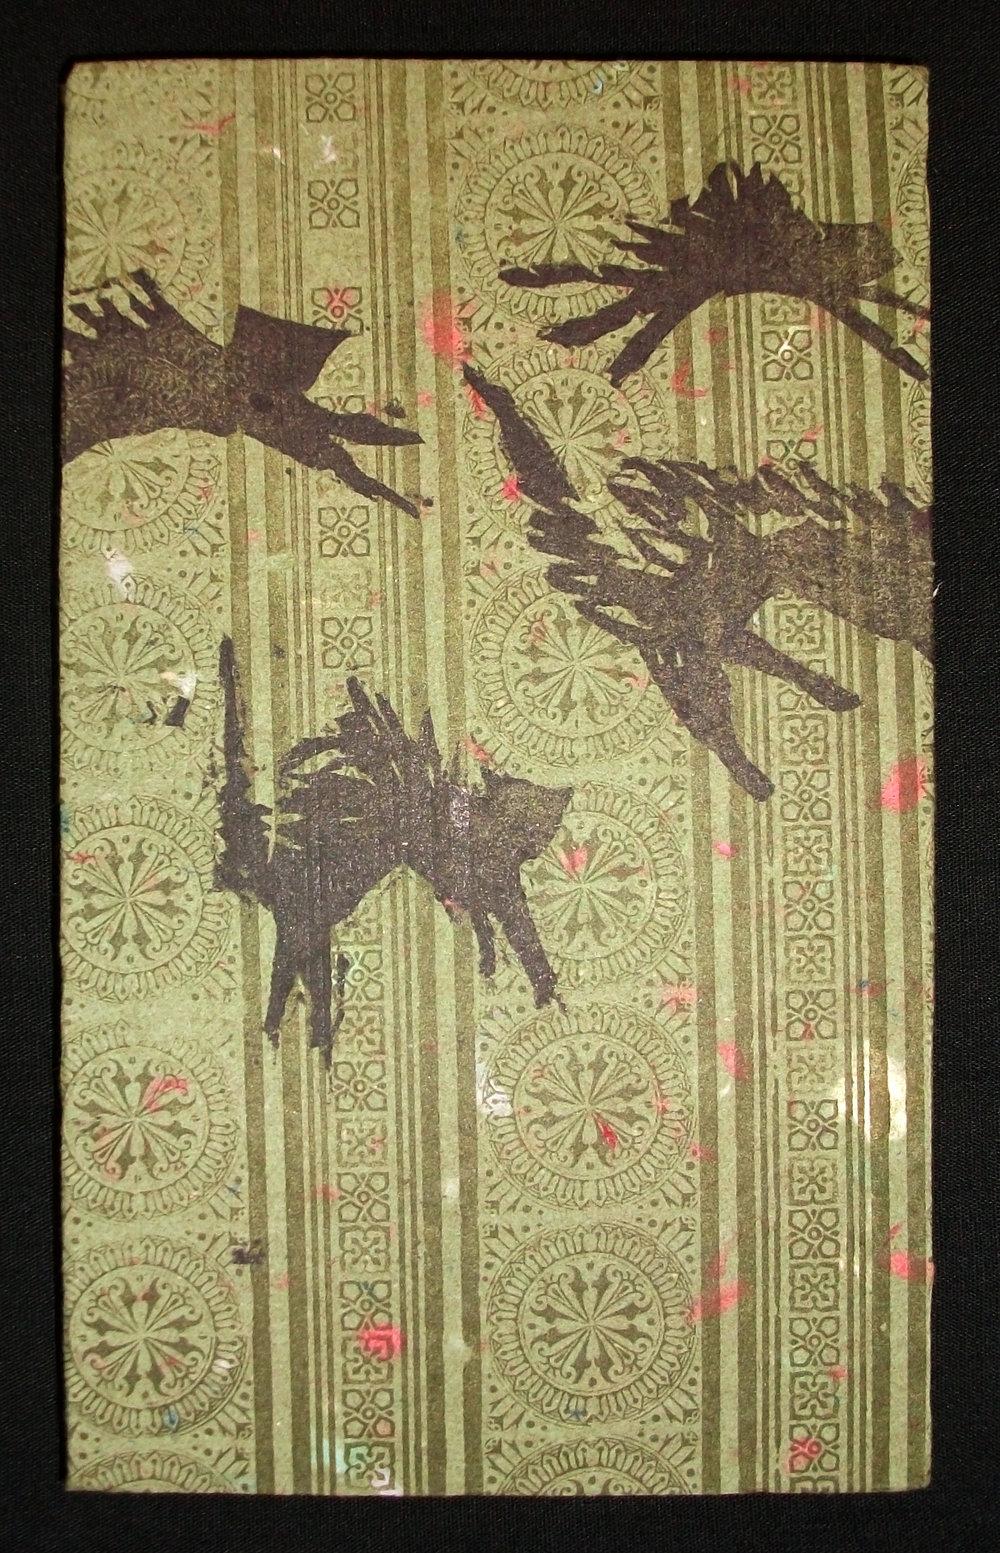 Katie Platte,  Robinson Cursoe's Cats,  Handmade Paper, Letterpress, Woodcuts, 2012, $50